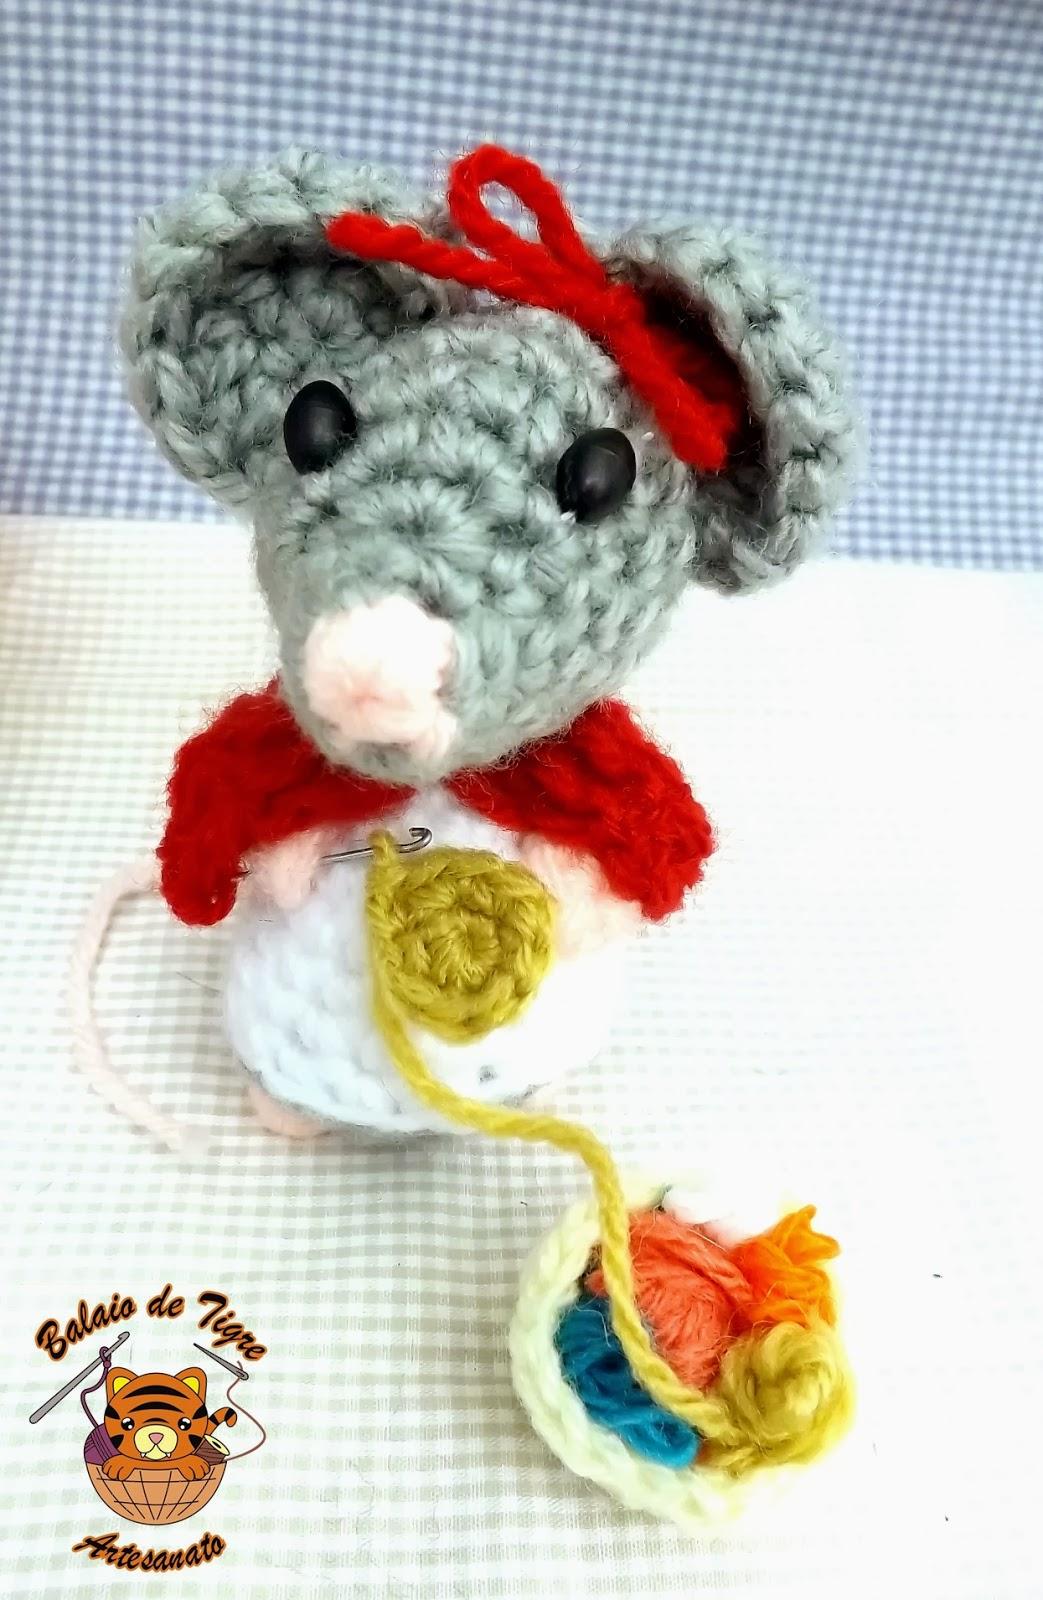 Amigurumi Mirabella, ratinha crocheteira da balaio de tigre